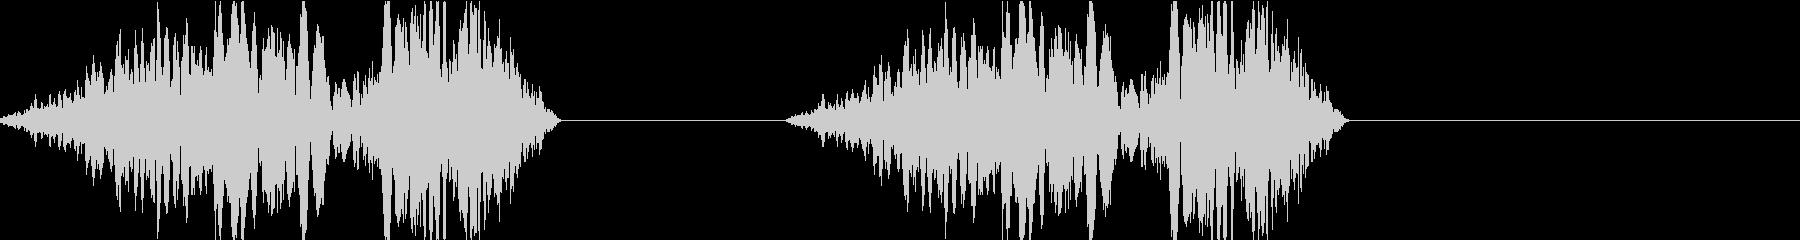 DJプレイ スクラッチ・ノイズ 197の未再生の波形